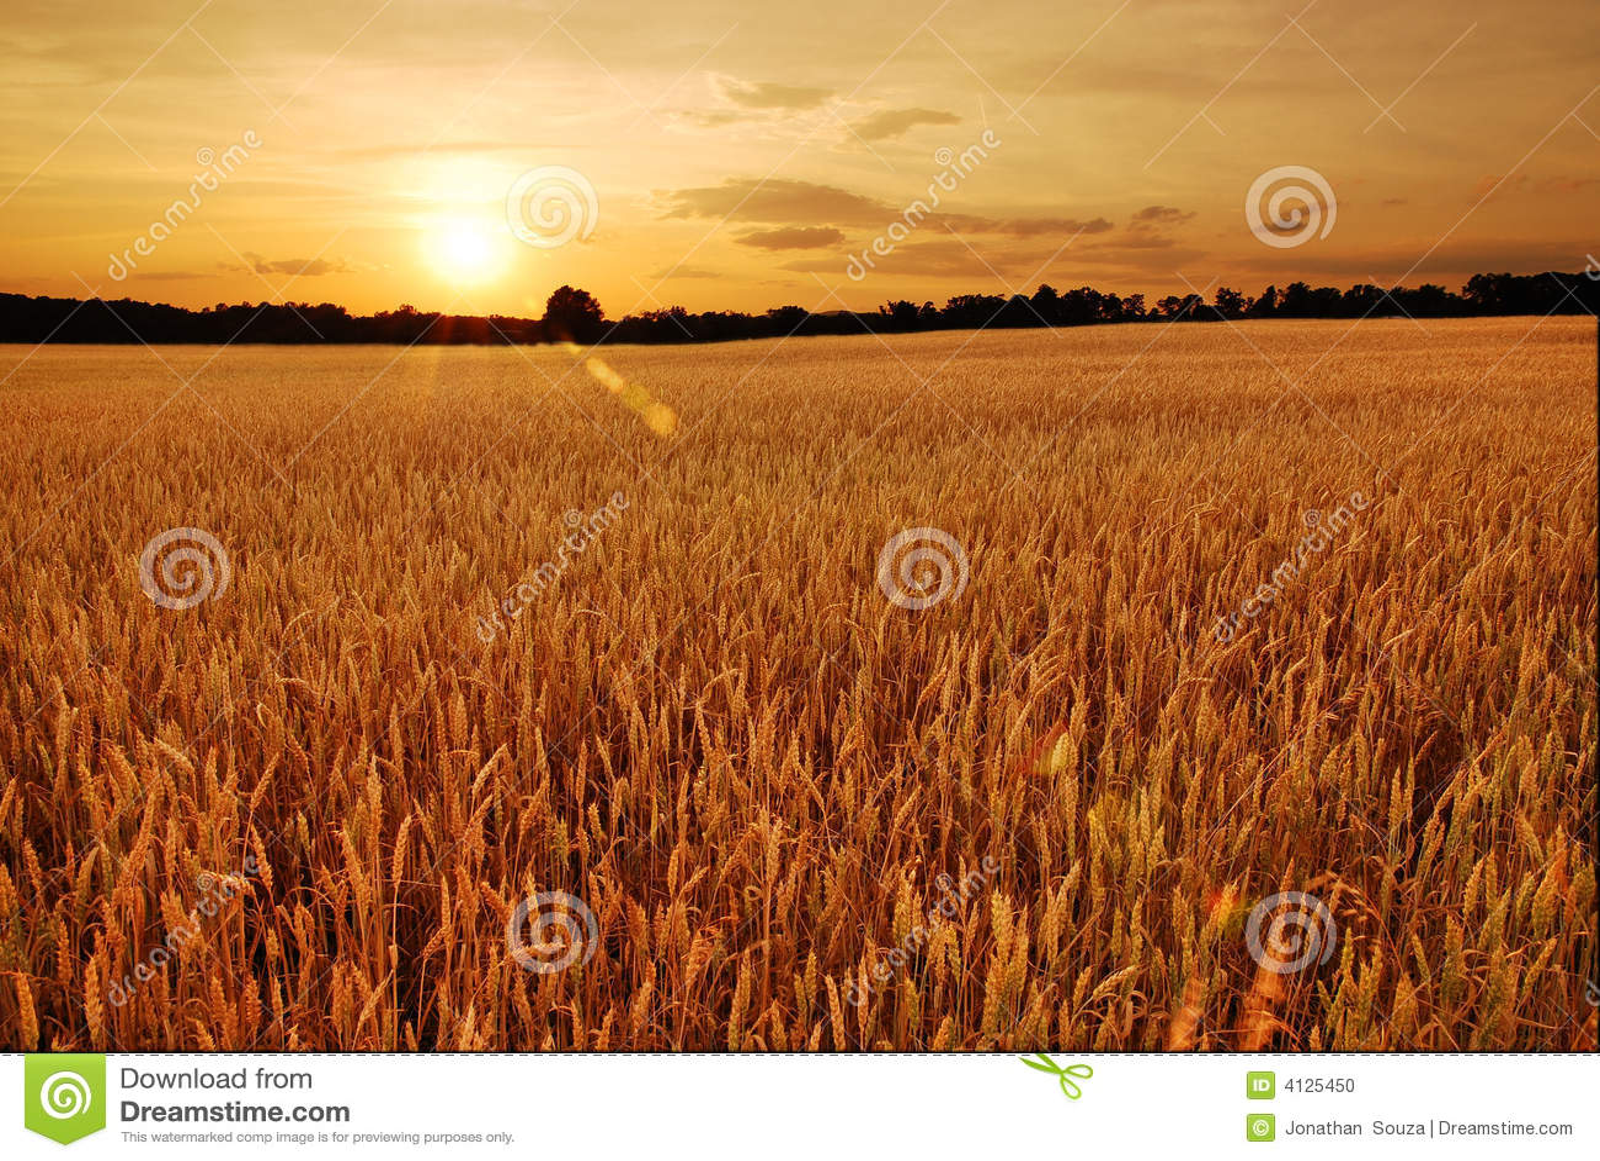 Wheat fields at sunset